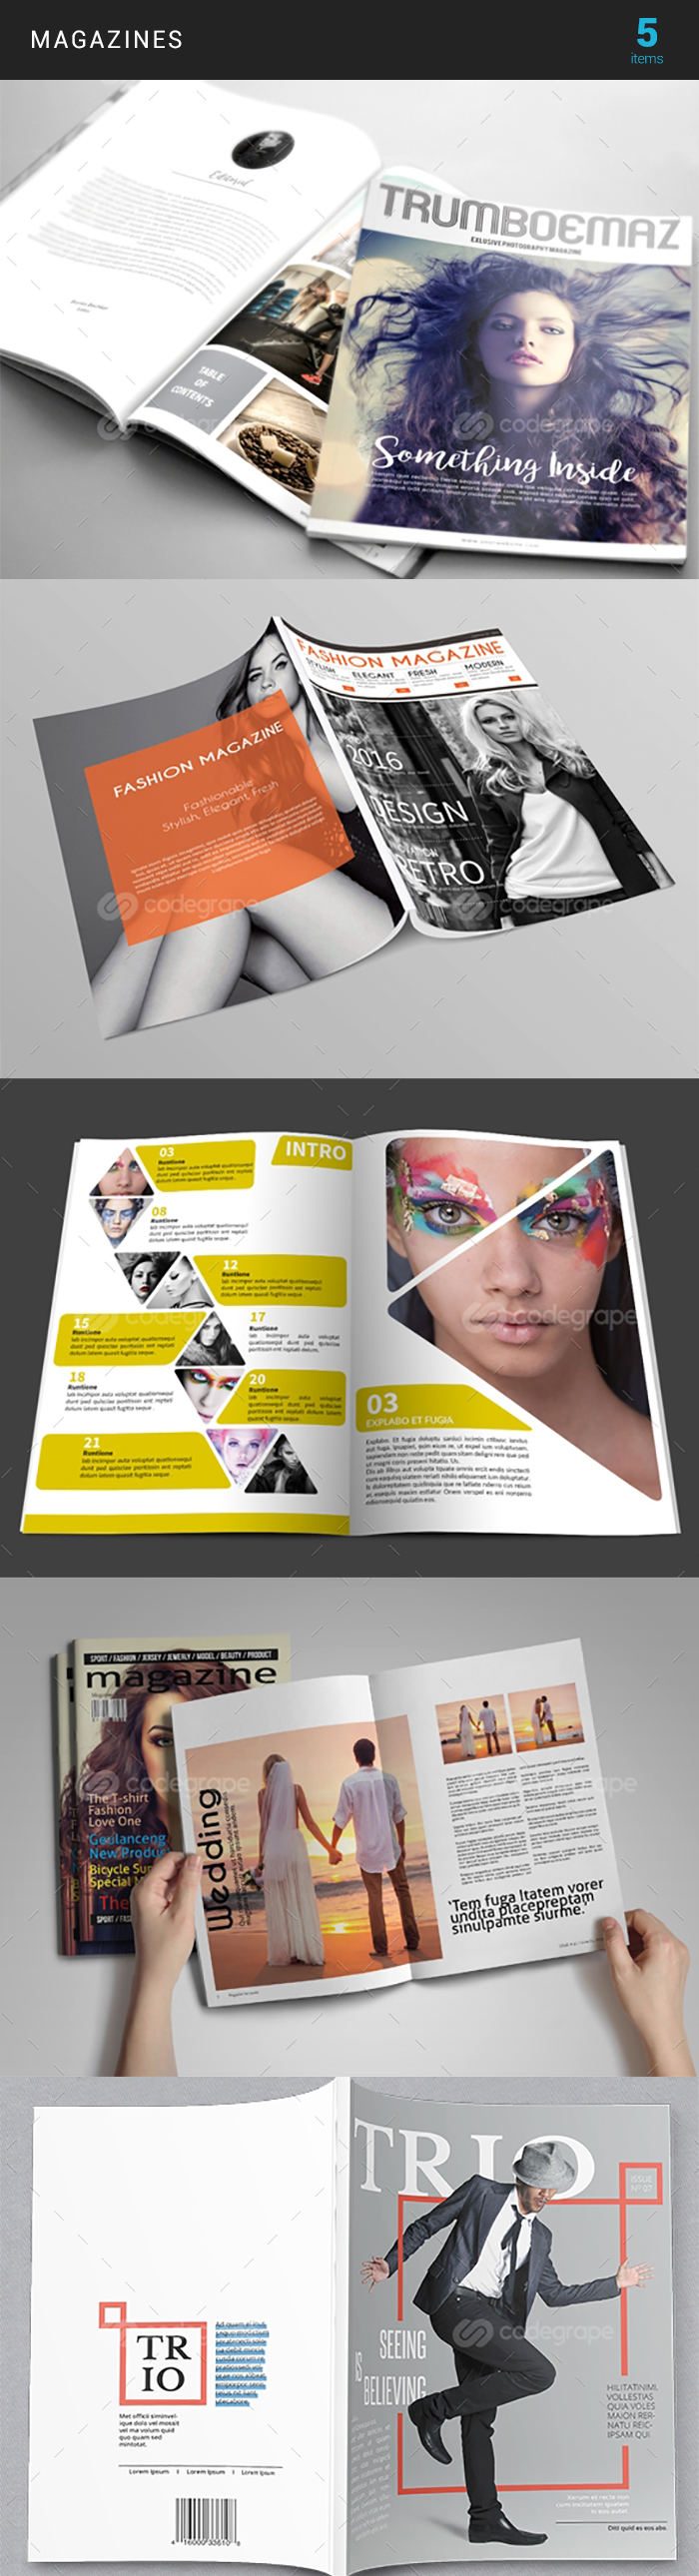 Elegant Print Templates Bundle with 100 Items - Only $19 - magazine